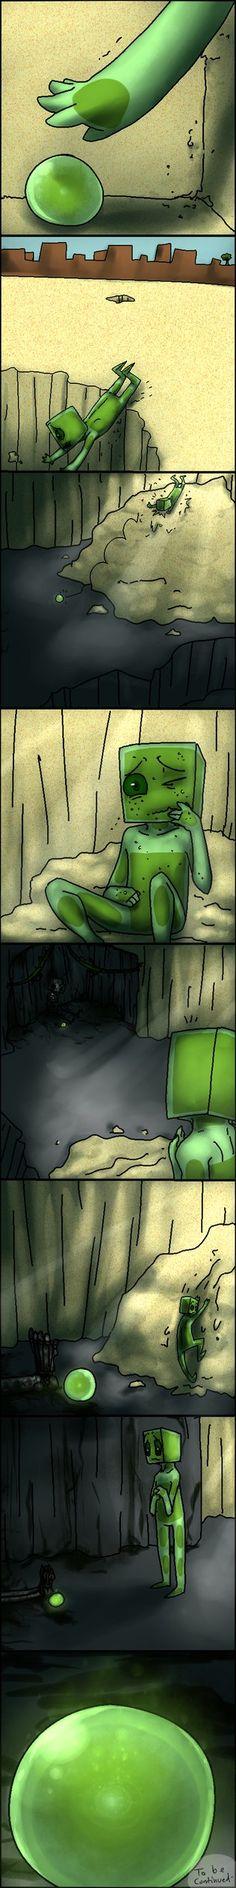 Little Enderslime - Comic 2 Part 3 by AccursedAsche on DeviantArt